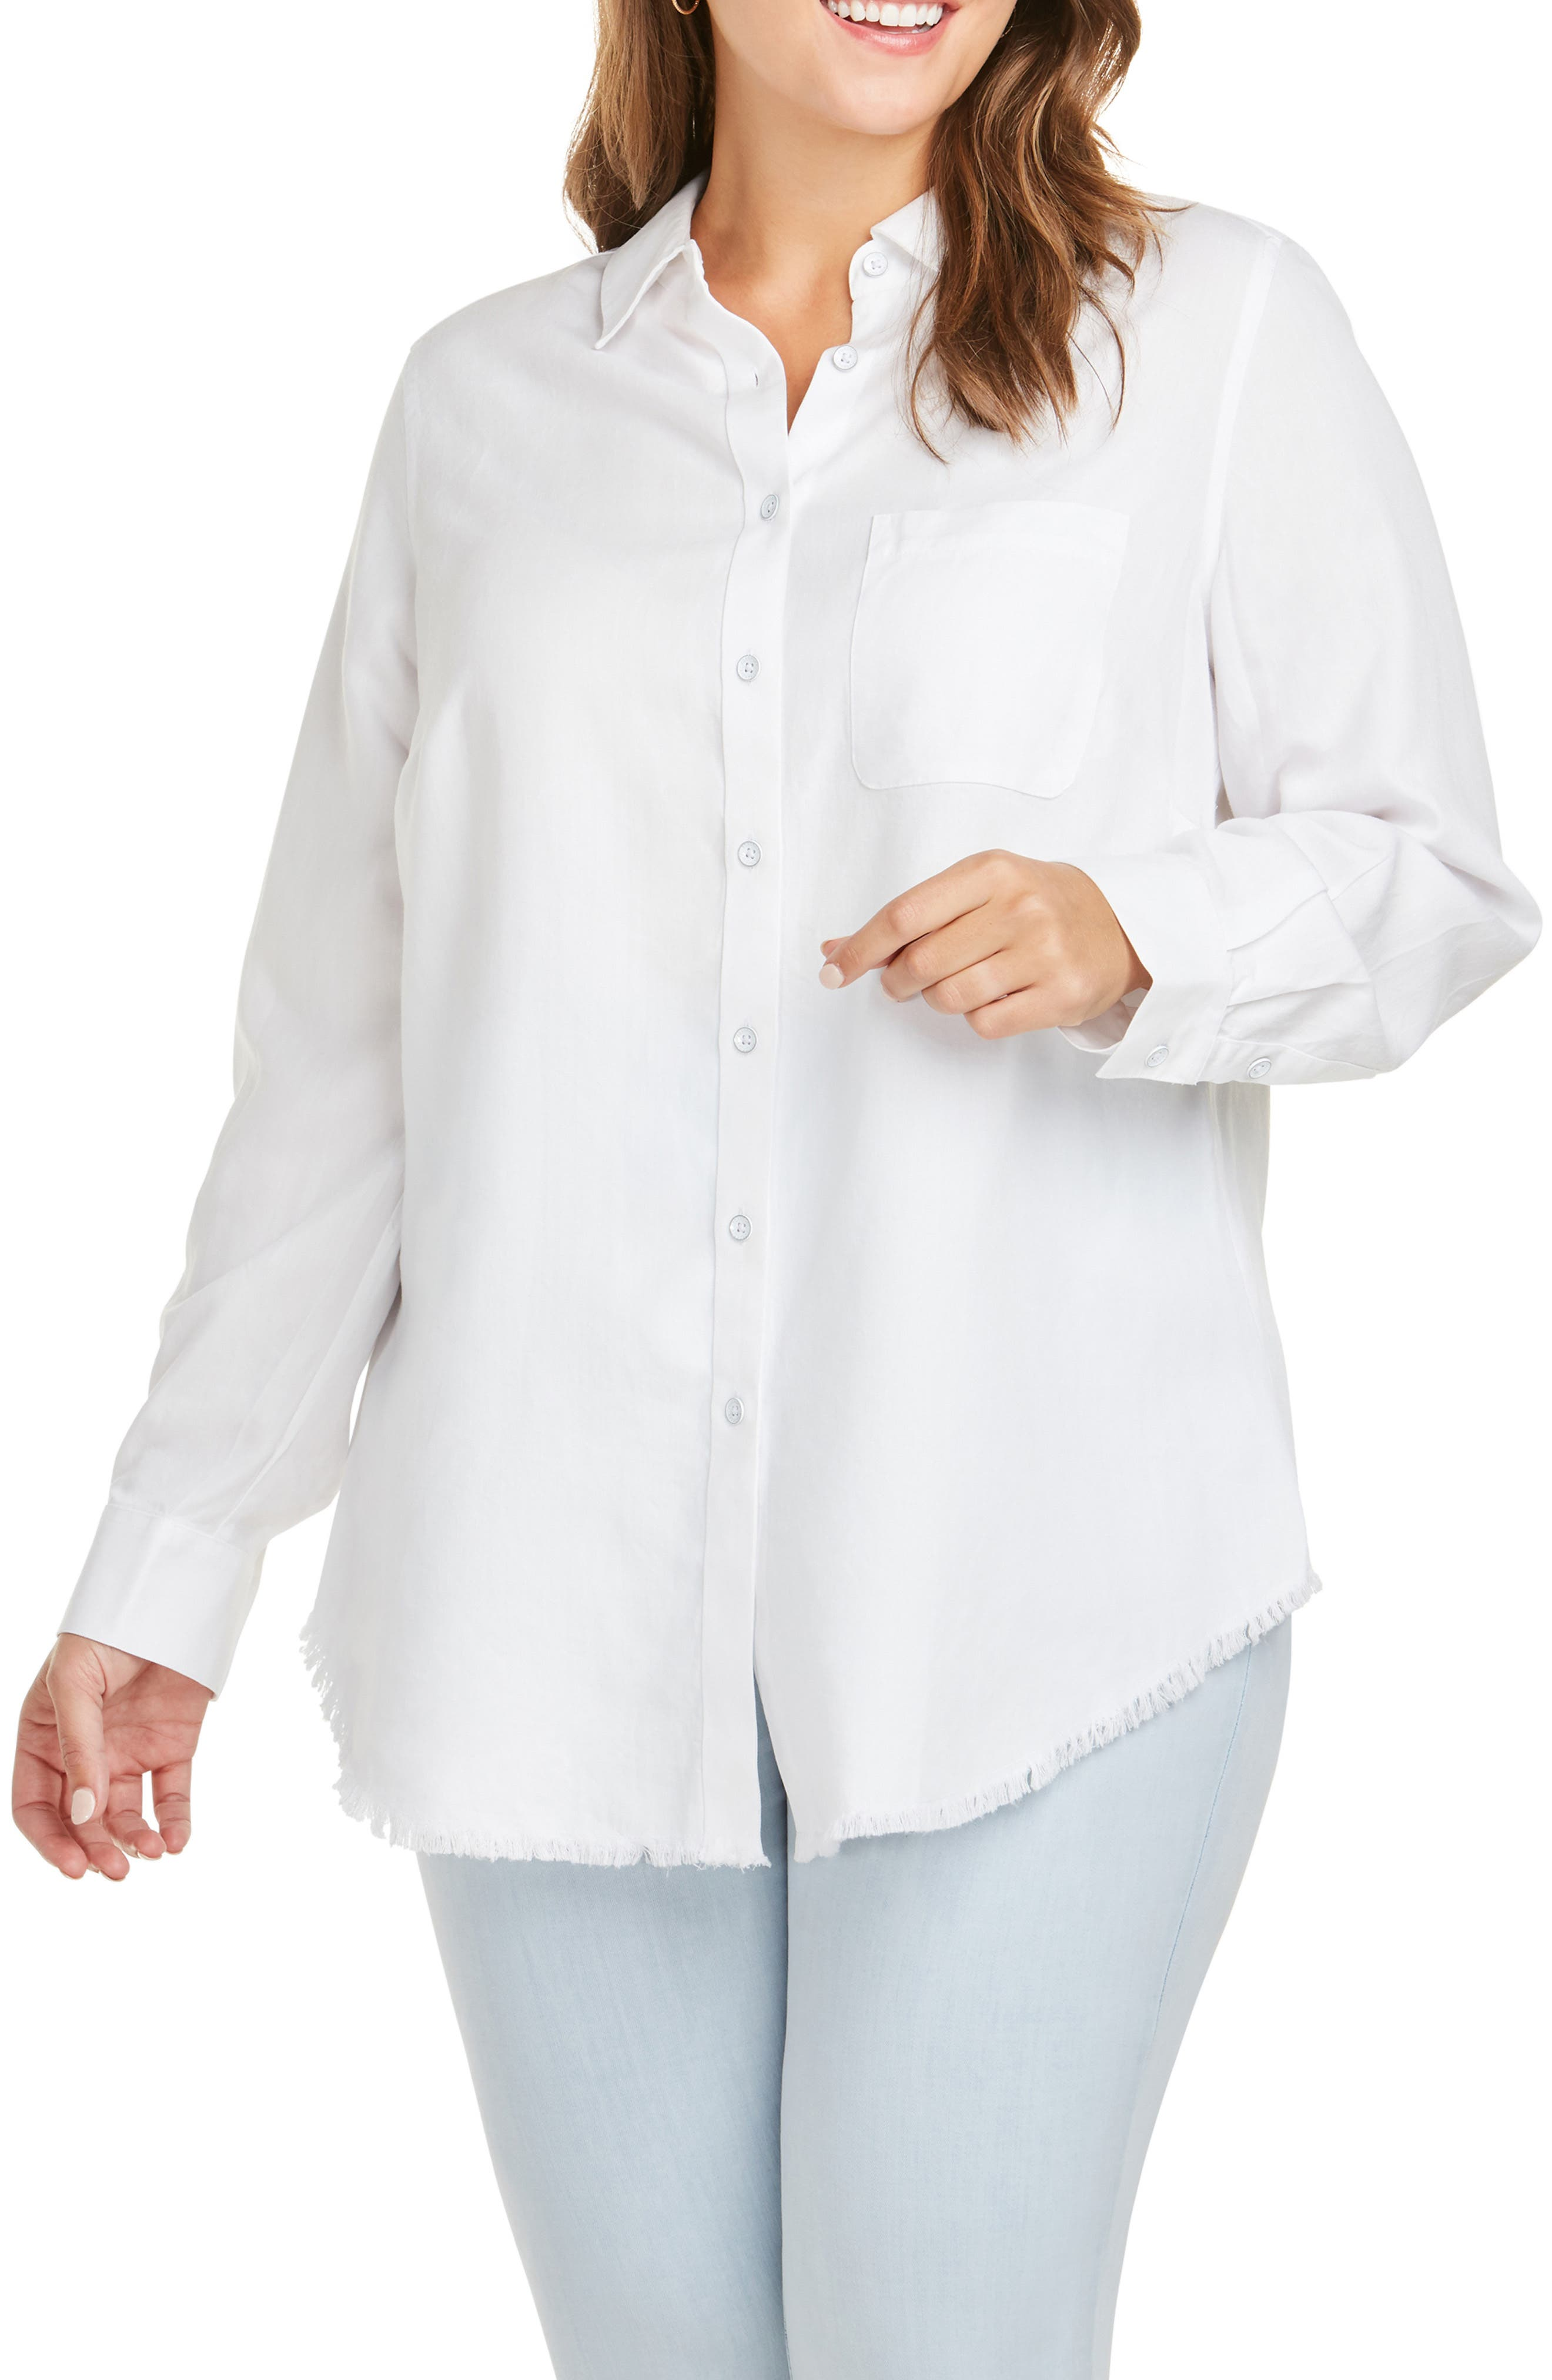 FOXCROFT Haven Shirt, Main, color, WHITE